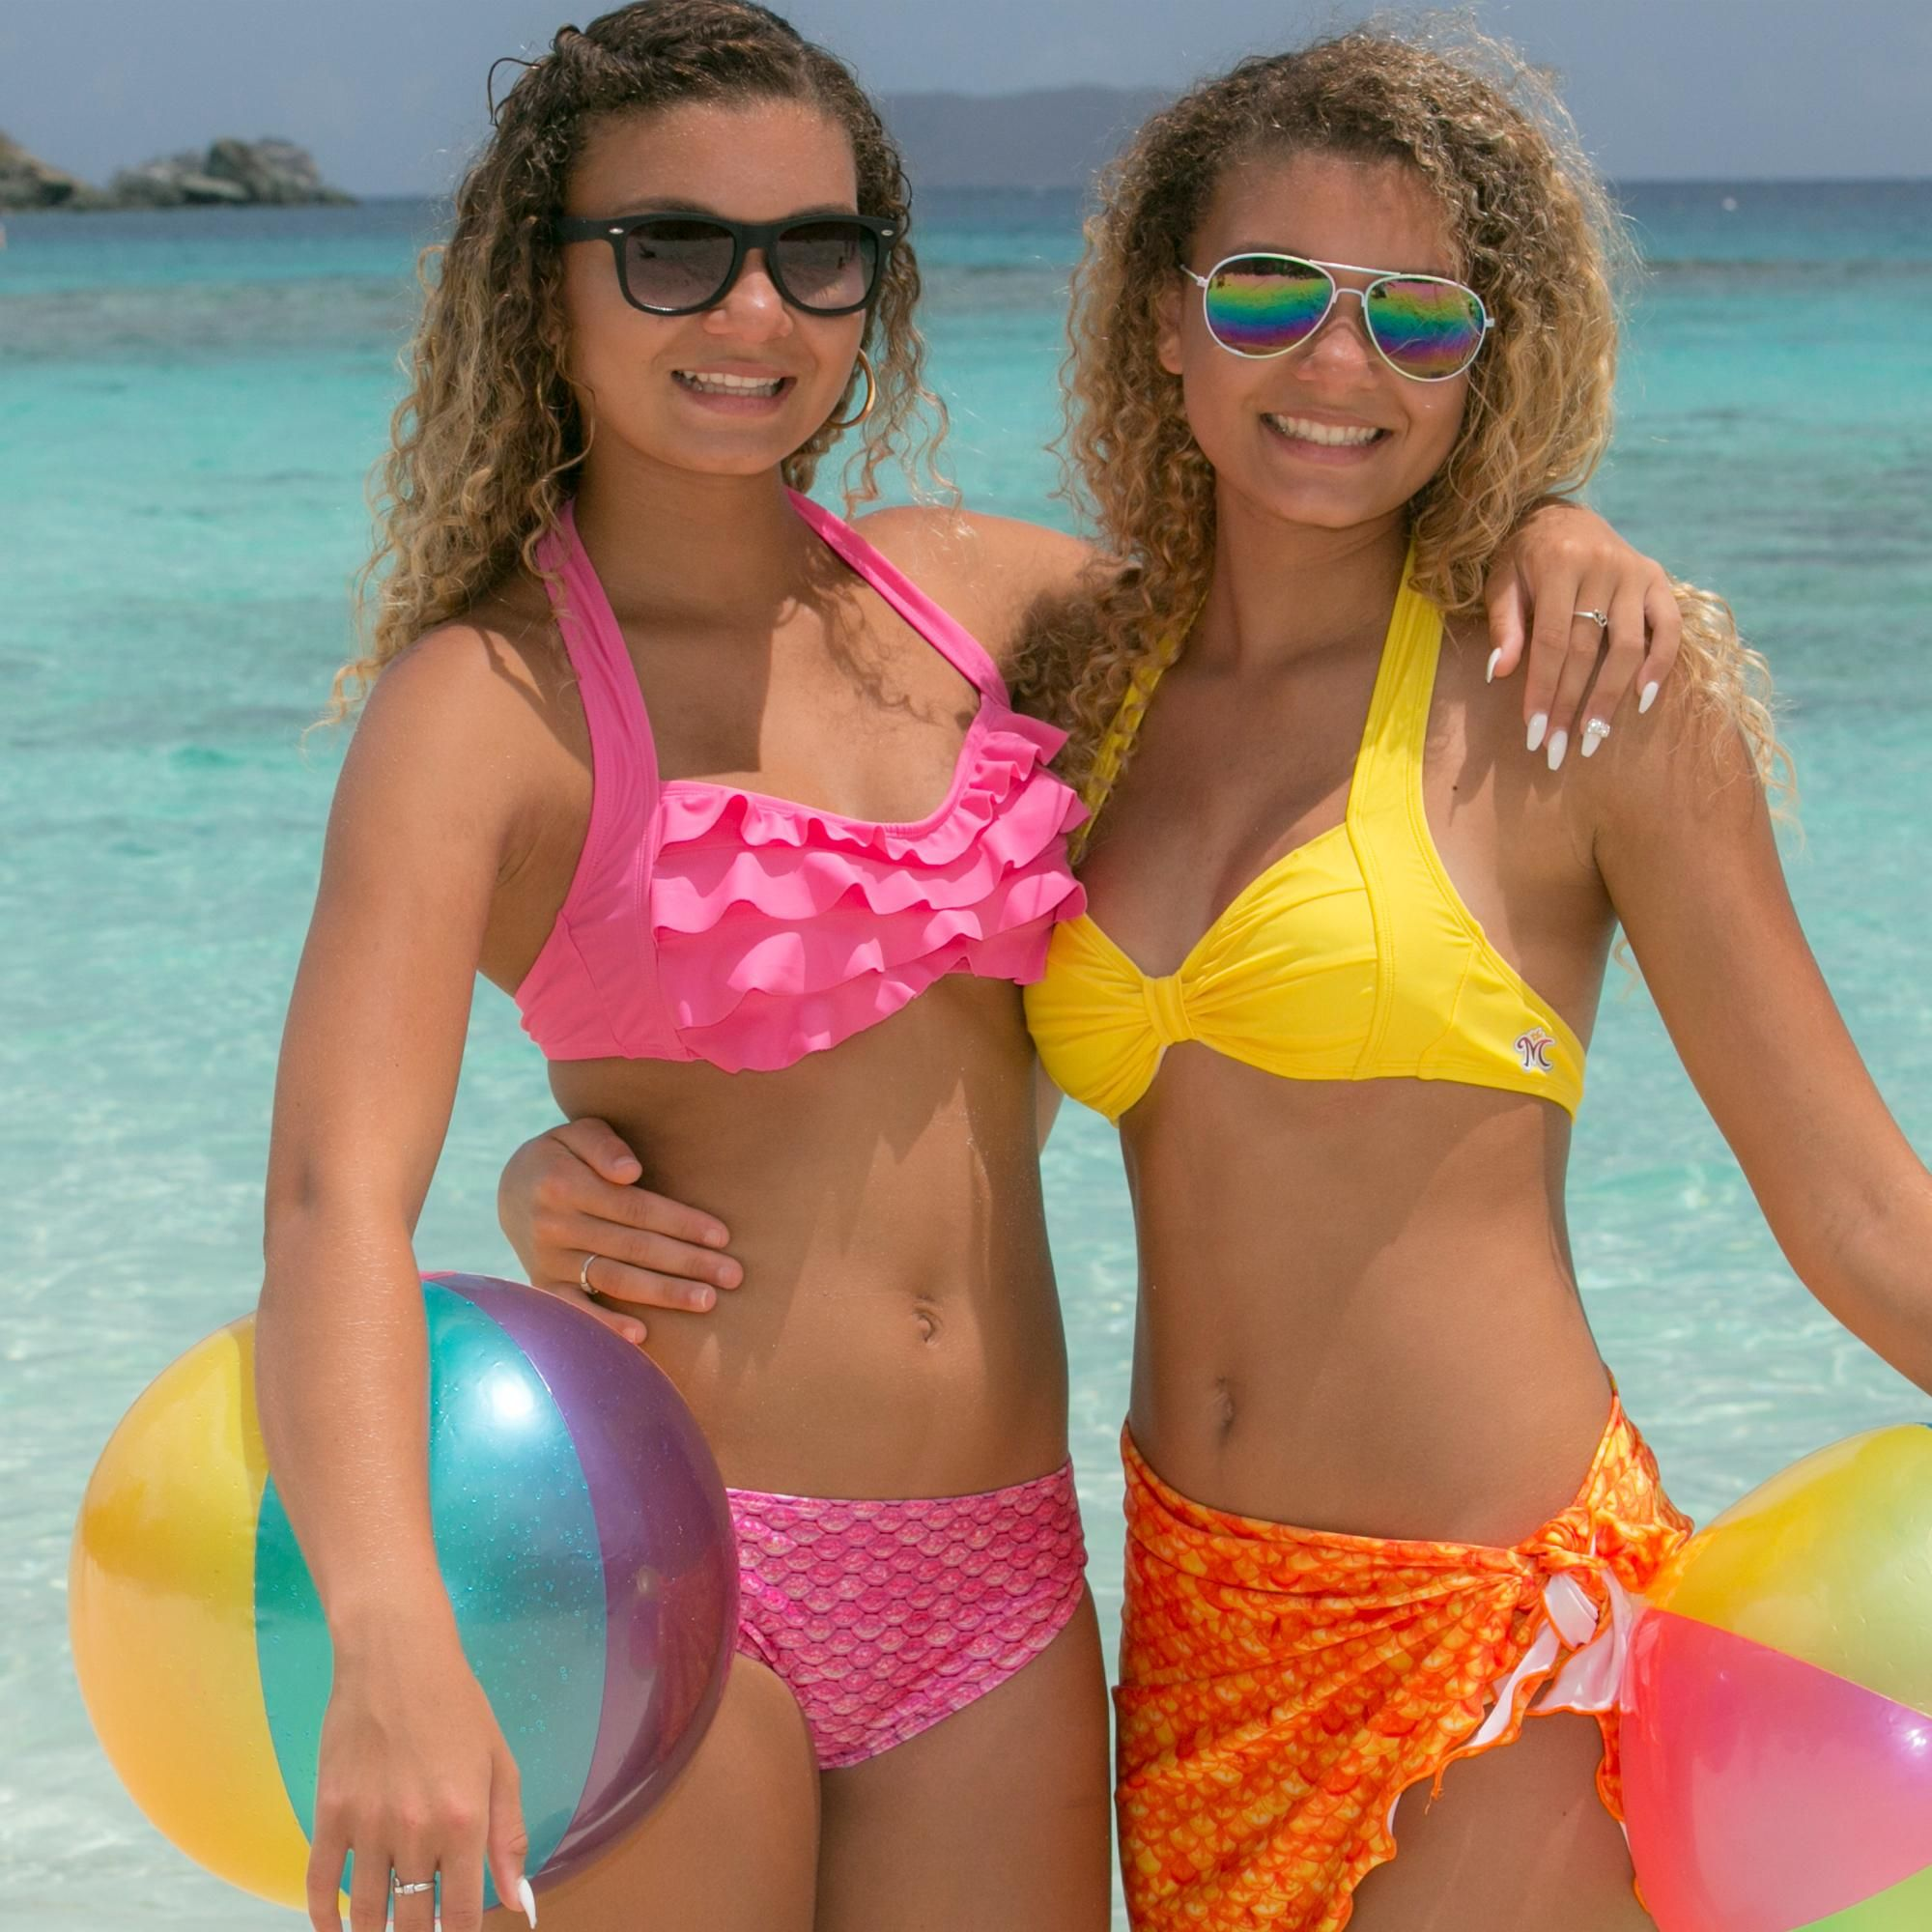 9a352d569c436 Mermaid Sea Wave Bikini Top in Pink